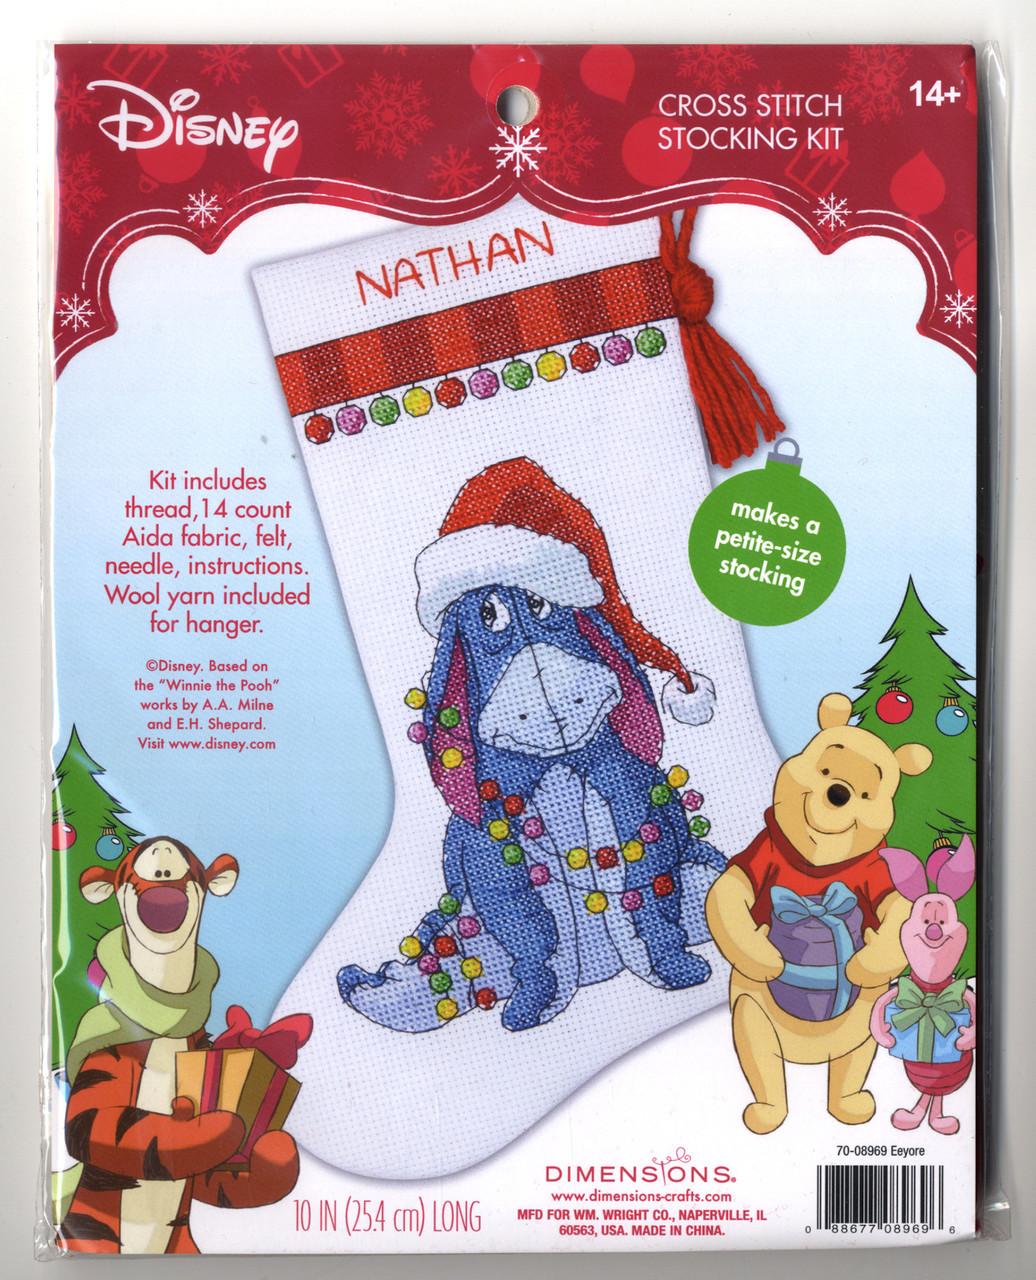 Disney - Eeyore Petite Size Stocking